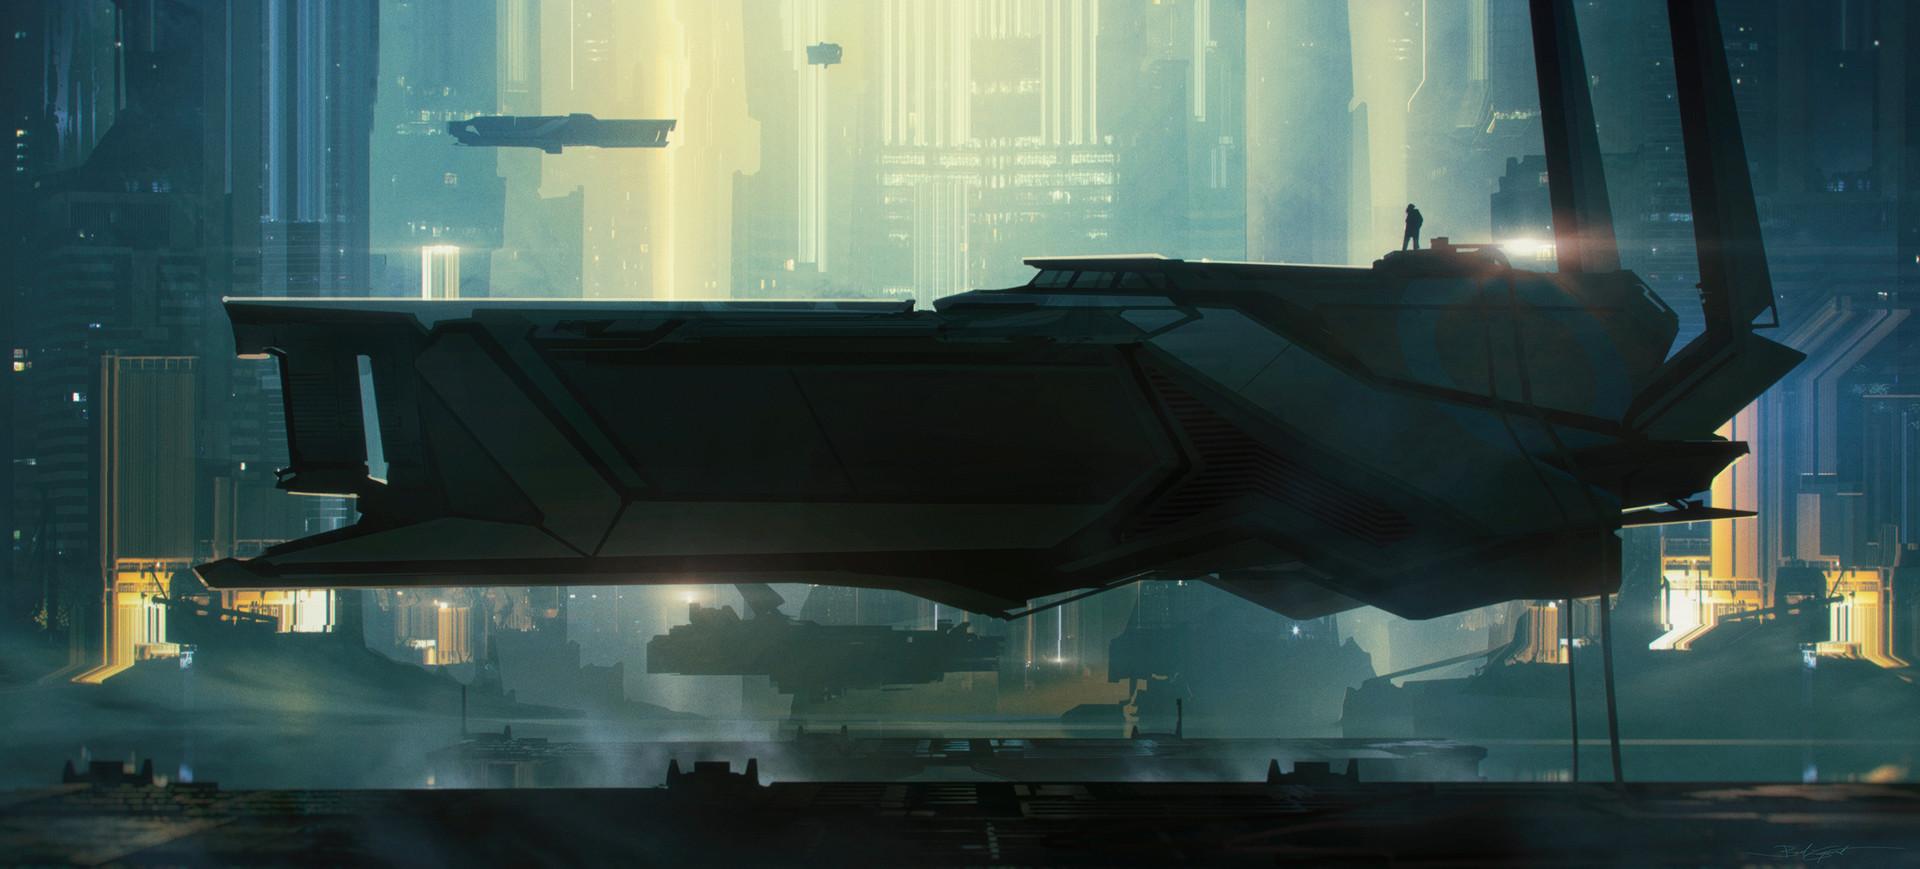 Bastien grivet spaceship trop cool